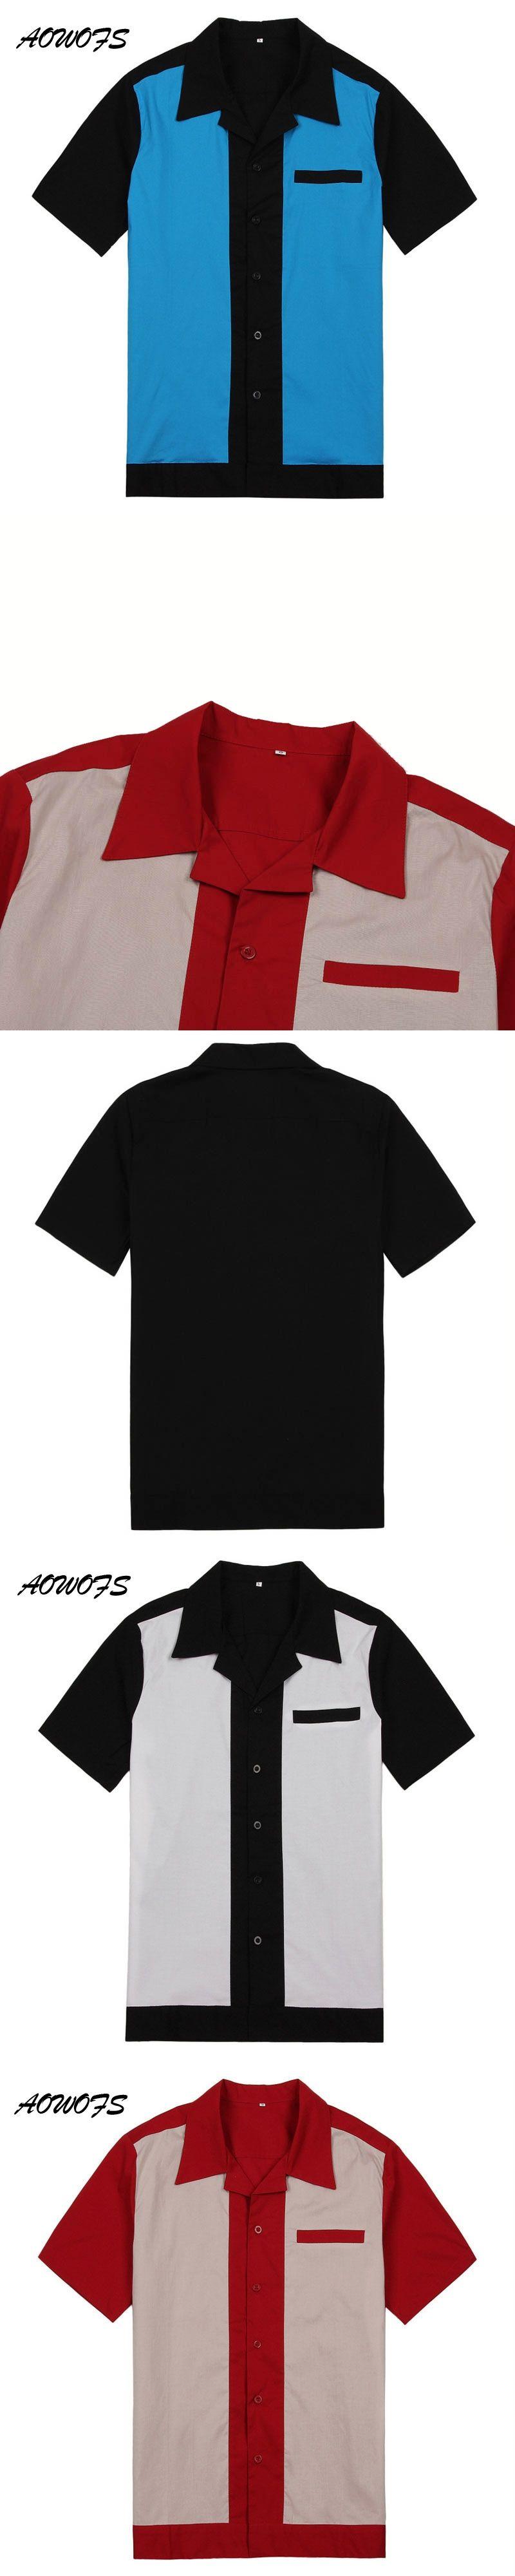 033633388b2 AOWOFS Rockabilly Men Western Cowboy Shirts Men Short Sleeve Black Shirts  Vintage Button Rockabilly Shirts Men